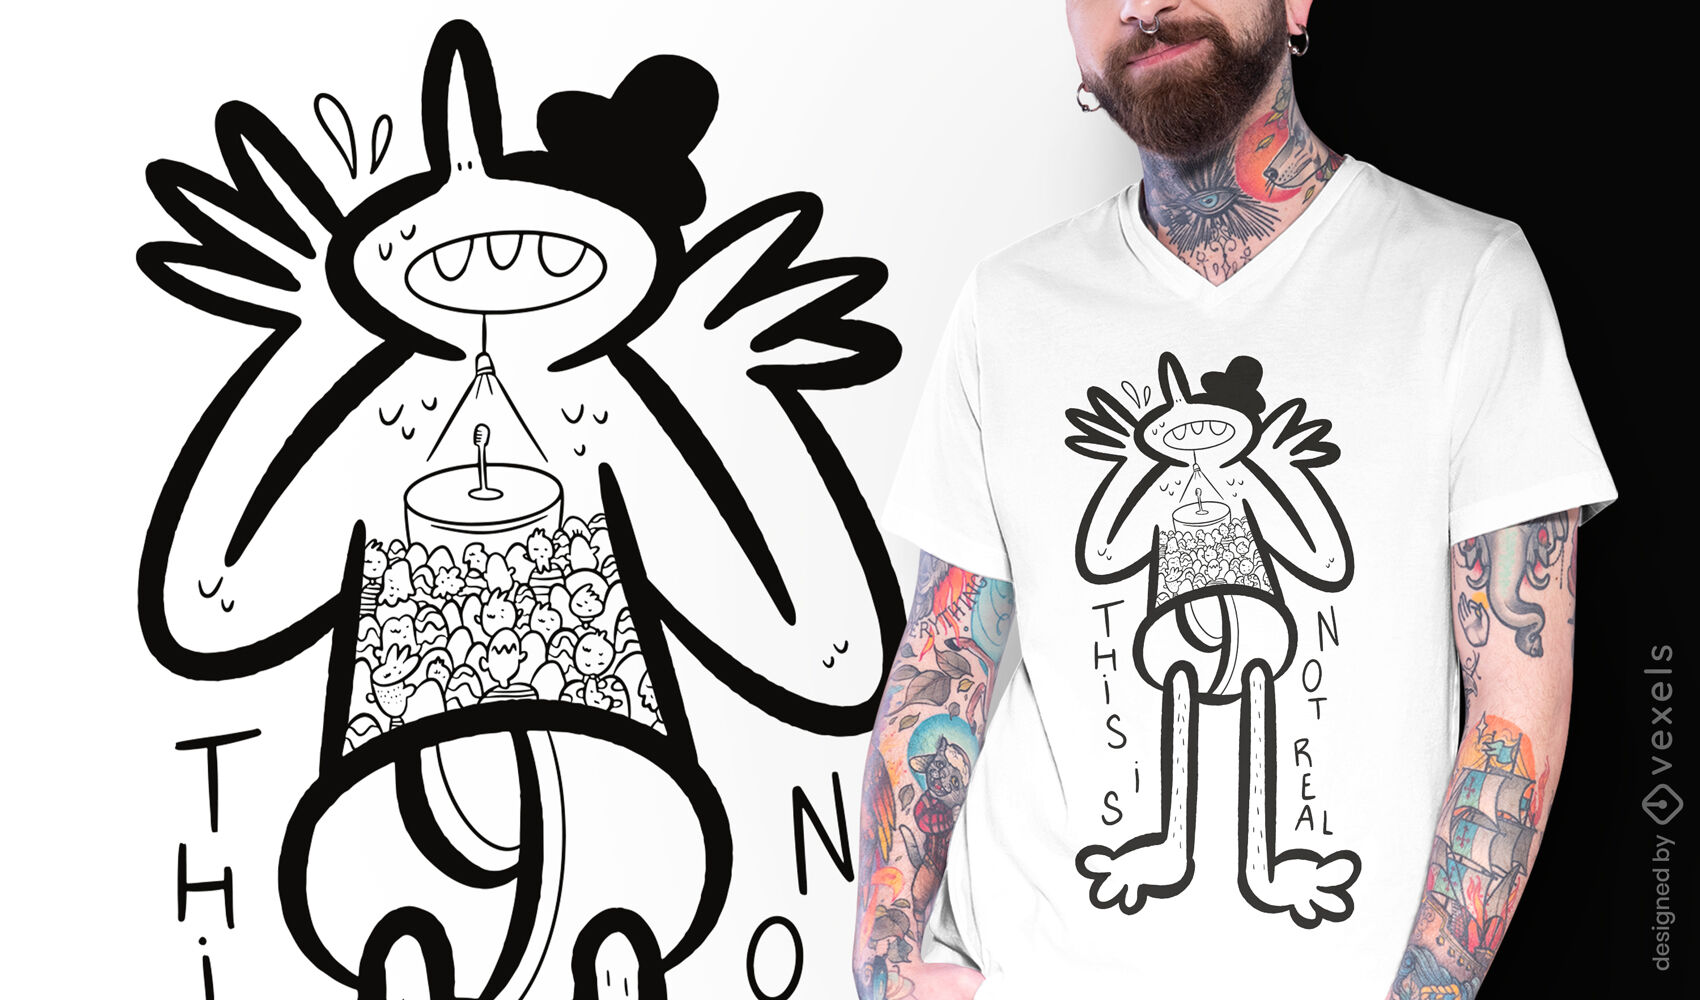 Scenic panic doodle t-shirt design